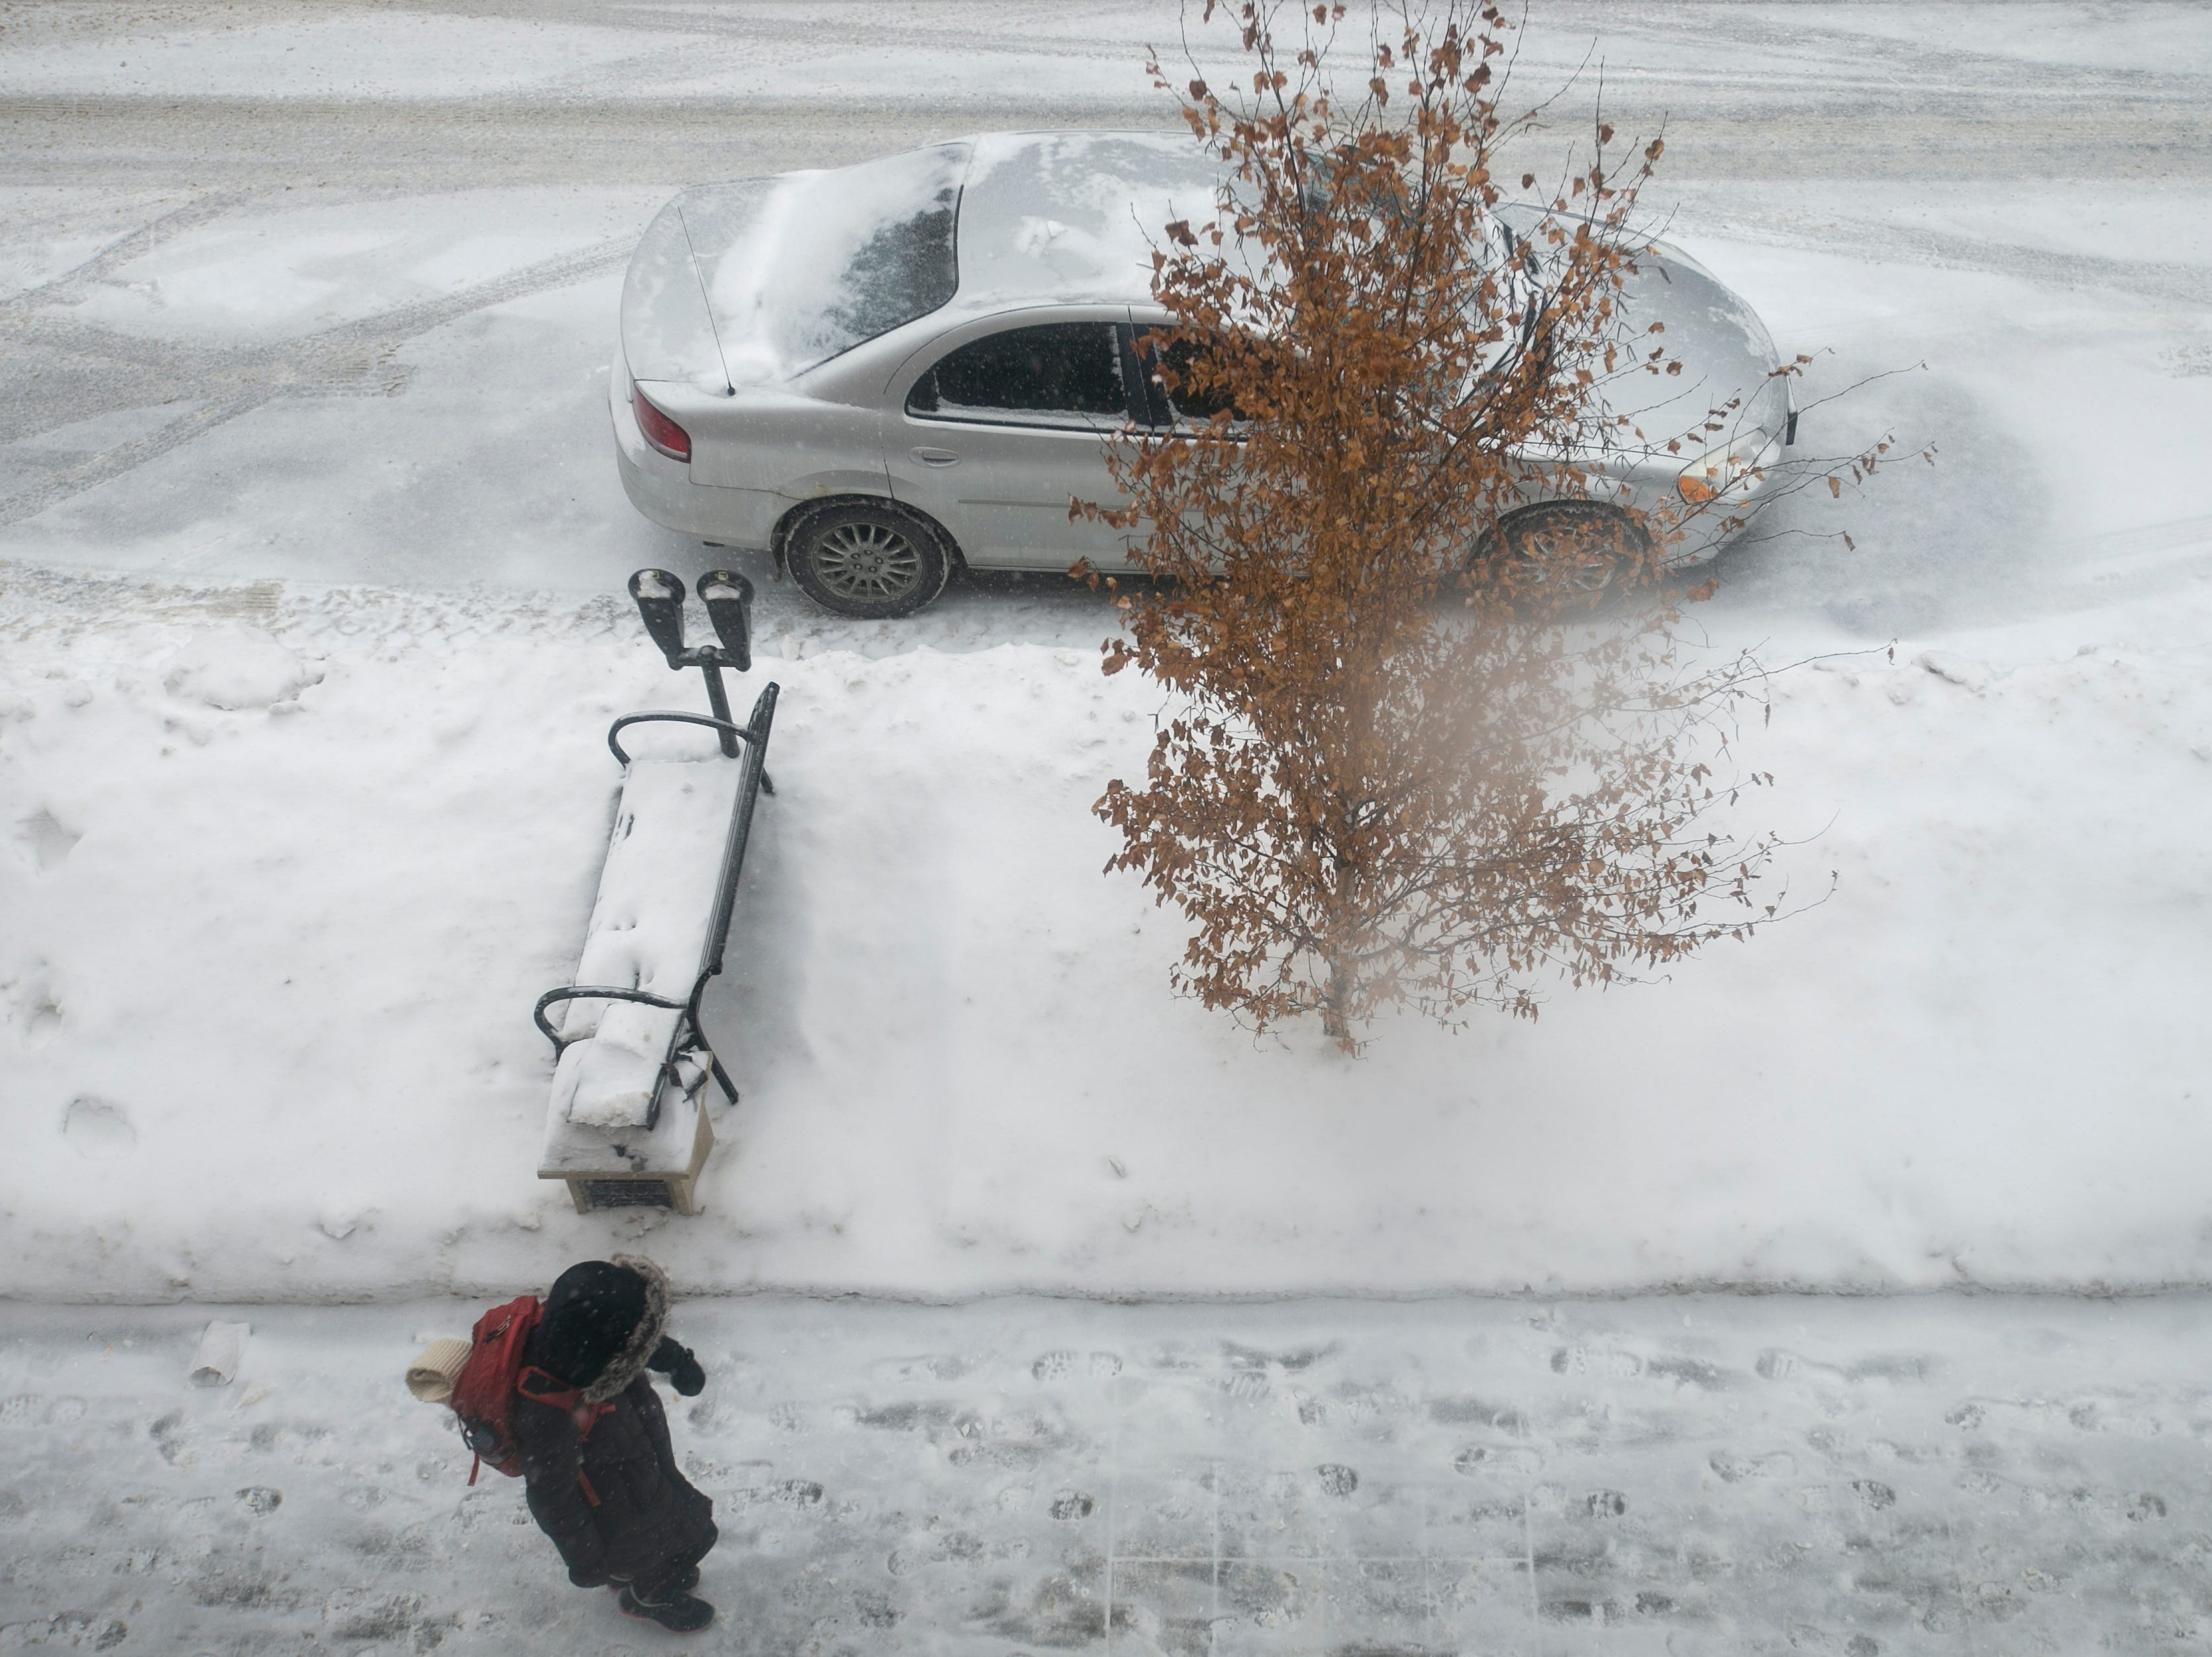 A person walks along Linn Street past a parked car as snow falls on Thursday, Jan. 31, 2019, in downtown Iowa City, Iowa.